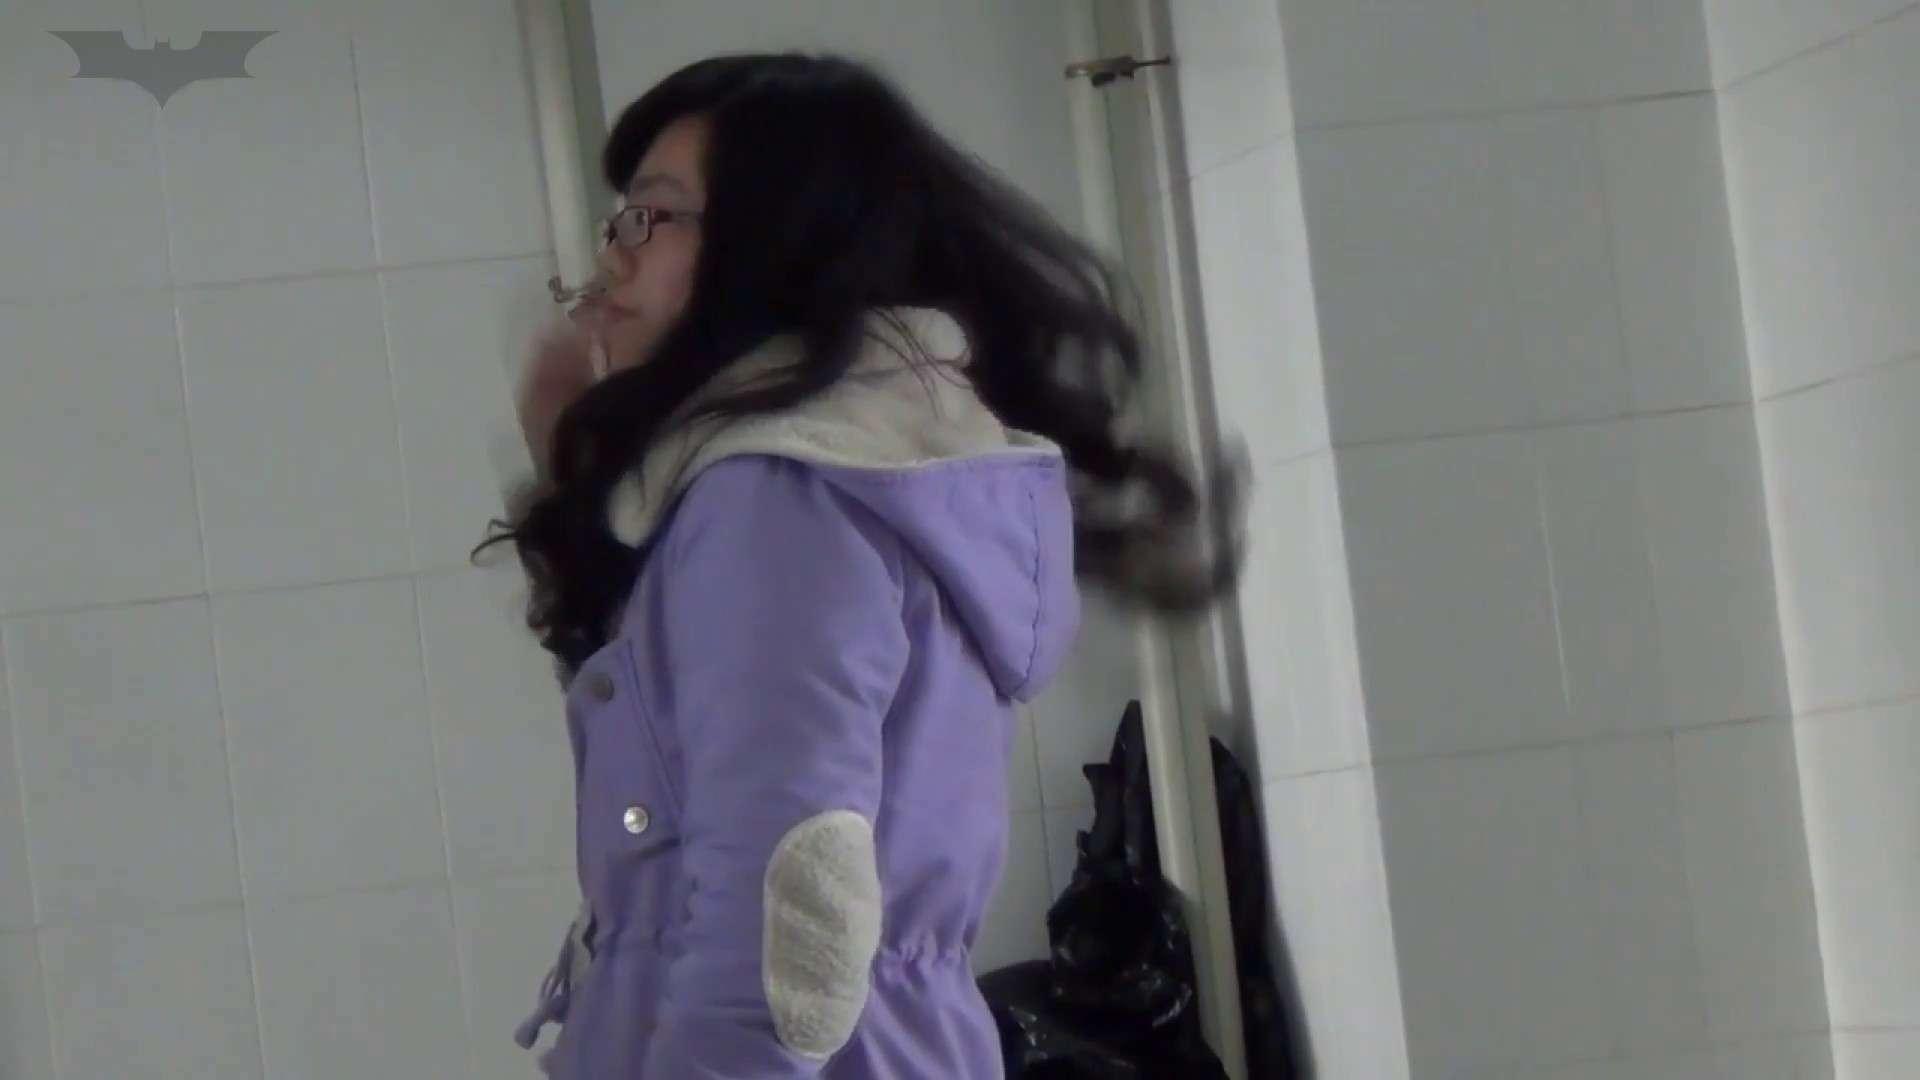 JD盗撮 美女の洗面所の秘密 Vol.26 OLのボディ 盗み撮り動画キャプチャ 73PIX 47